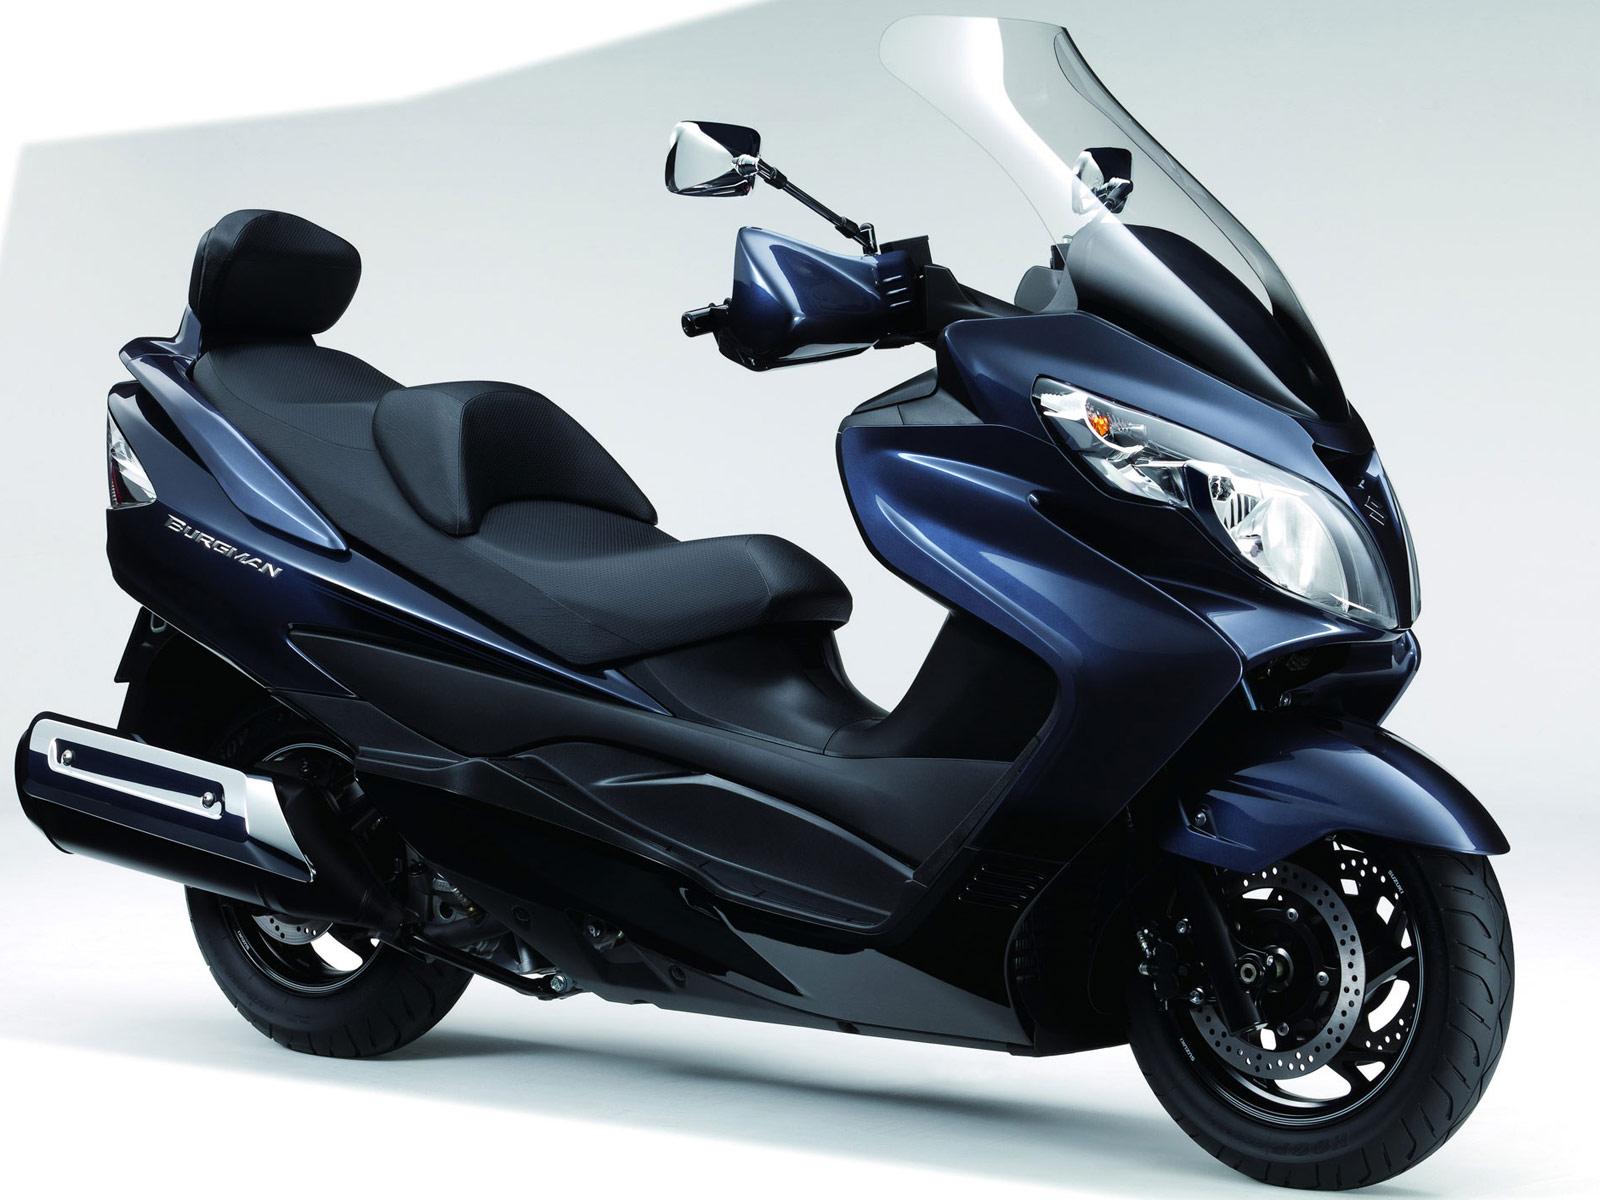 2012 Suzuki Burgman 400 Abs Motorcycles Insurance